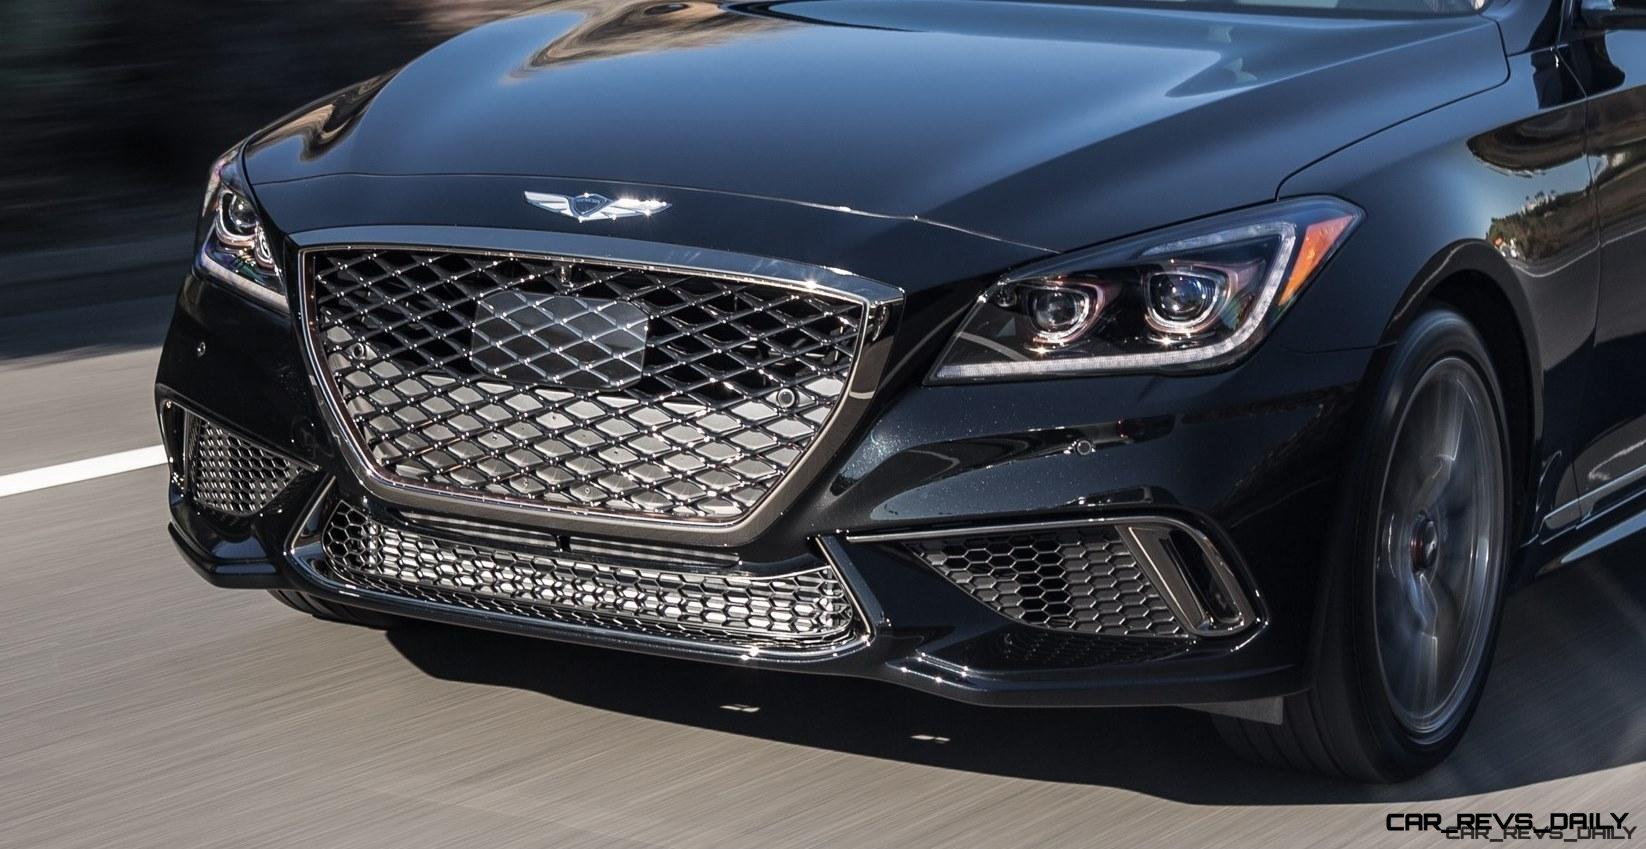 2018 Genesis G80 Sport Shows Gorgeous New Style, V6TT Upgrade